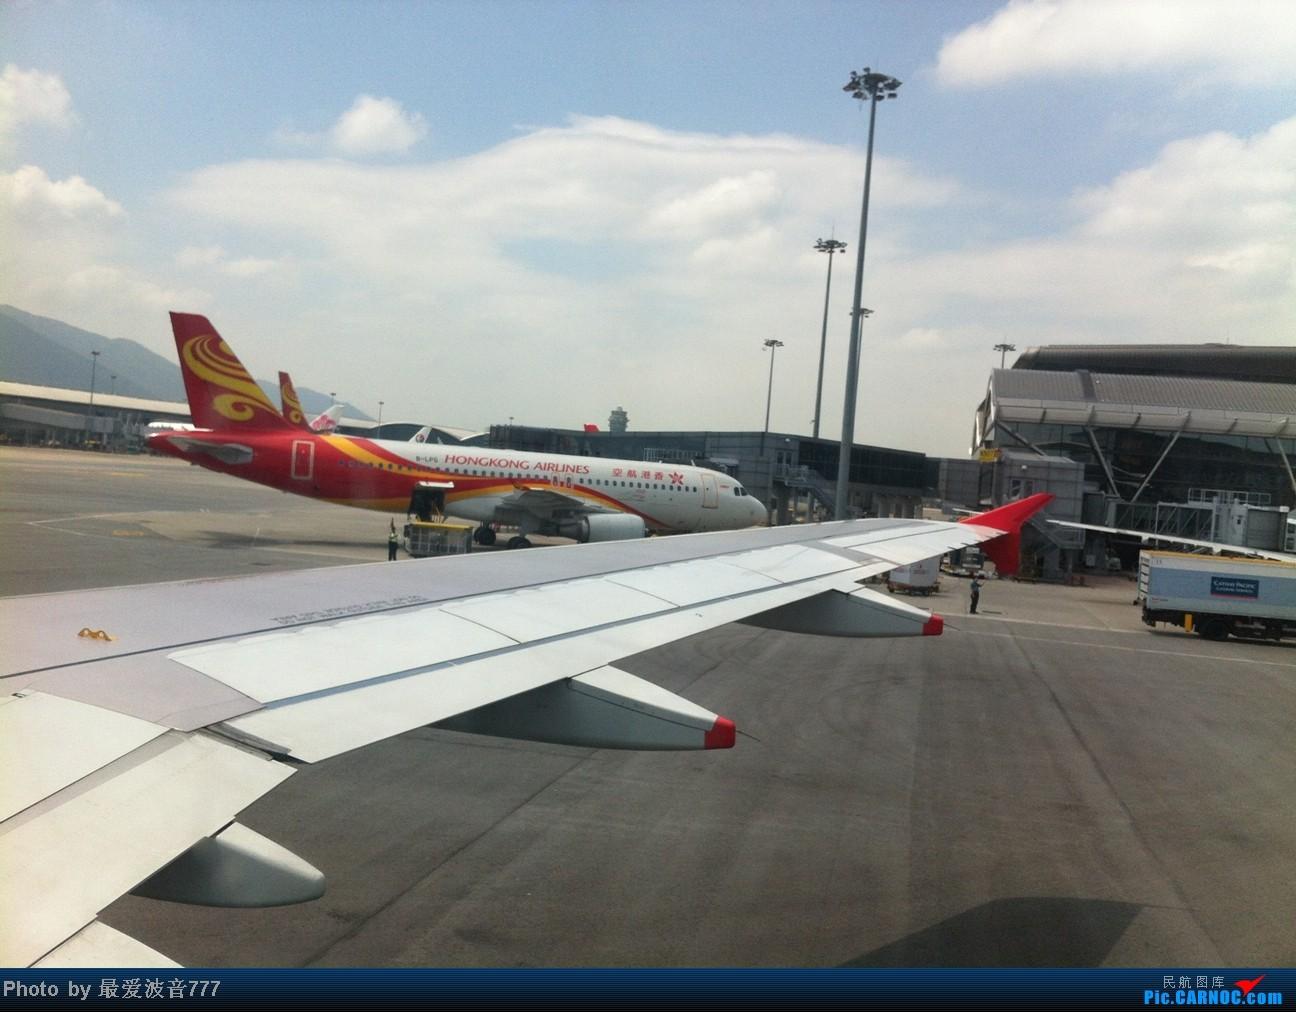 Re:[原创]假期的回国往返之旅 LHR-HKG-CTU-HKG-LHR, CX+CA+KA联合运营 AIRBUS A320 B-LPG 中国香港赤鱲角国际机场